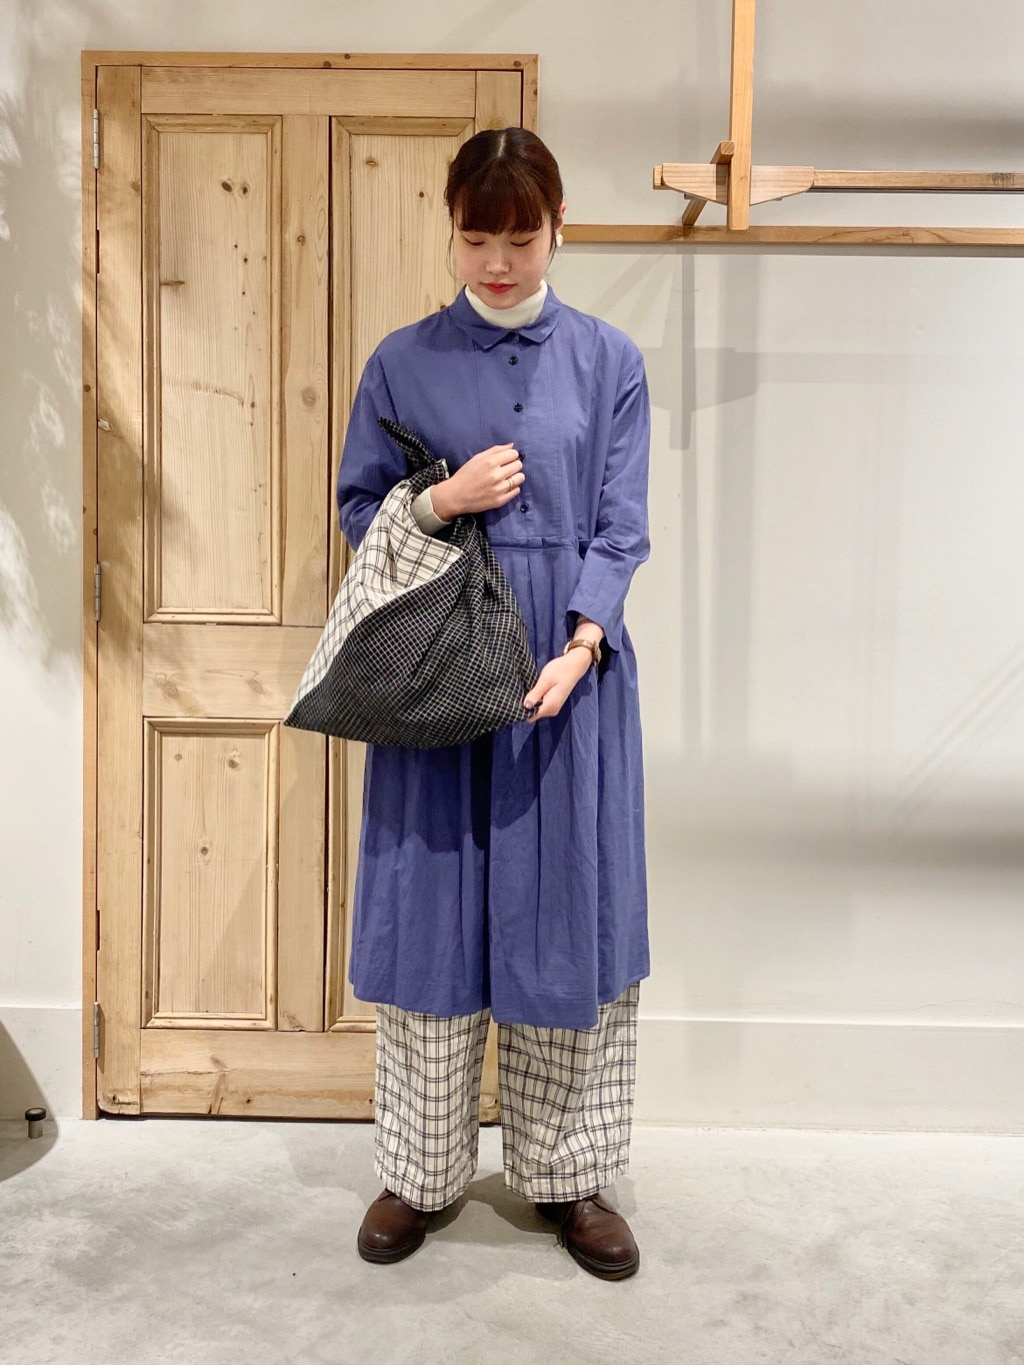 Malle chambre de charme 調布パルコ 身長:167cm 2020.09.24